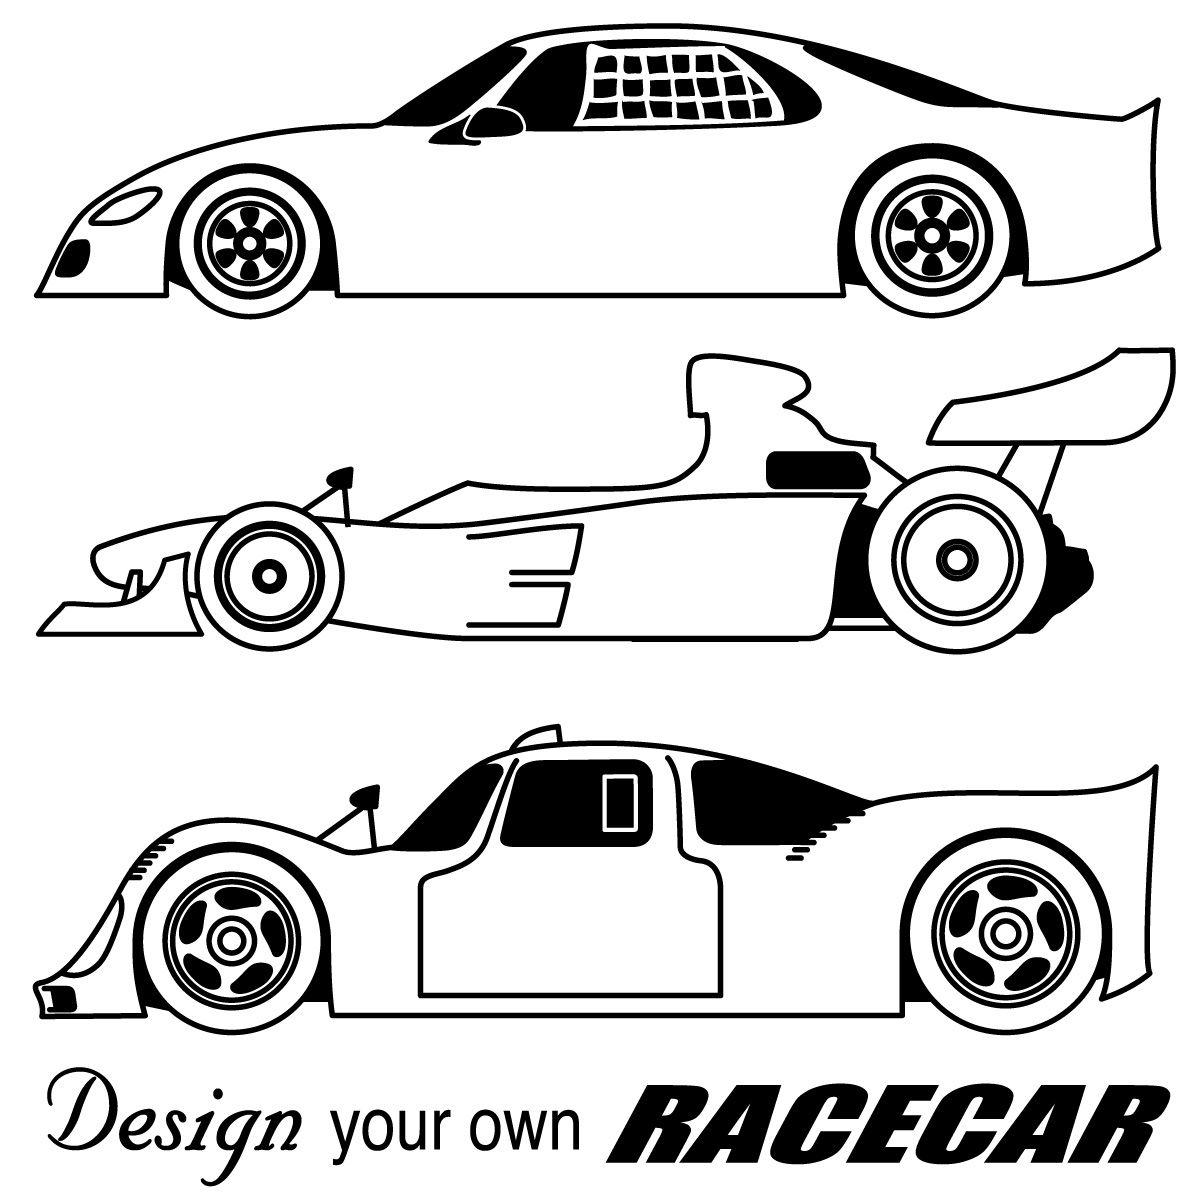 1000 images about race car on pinterest race cars coloring